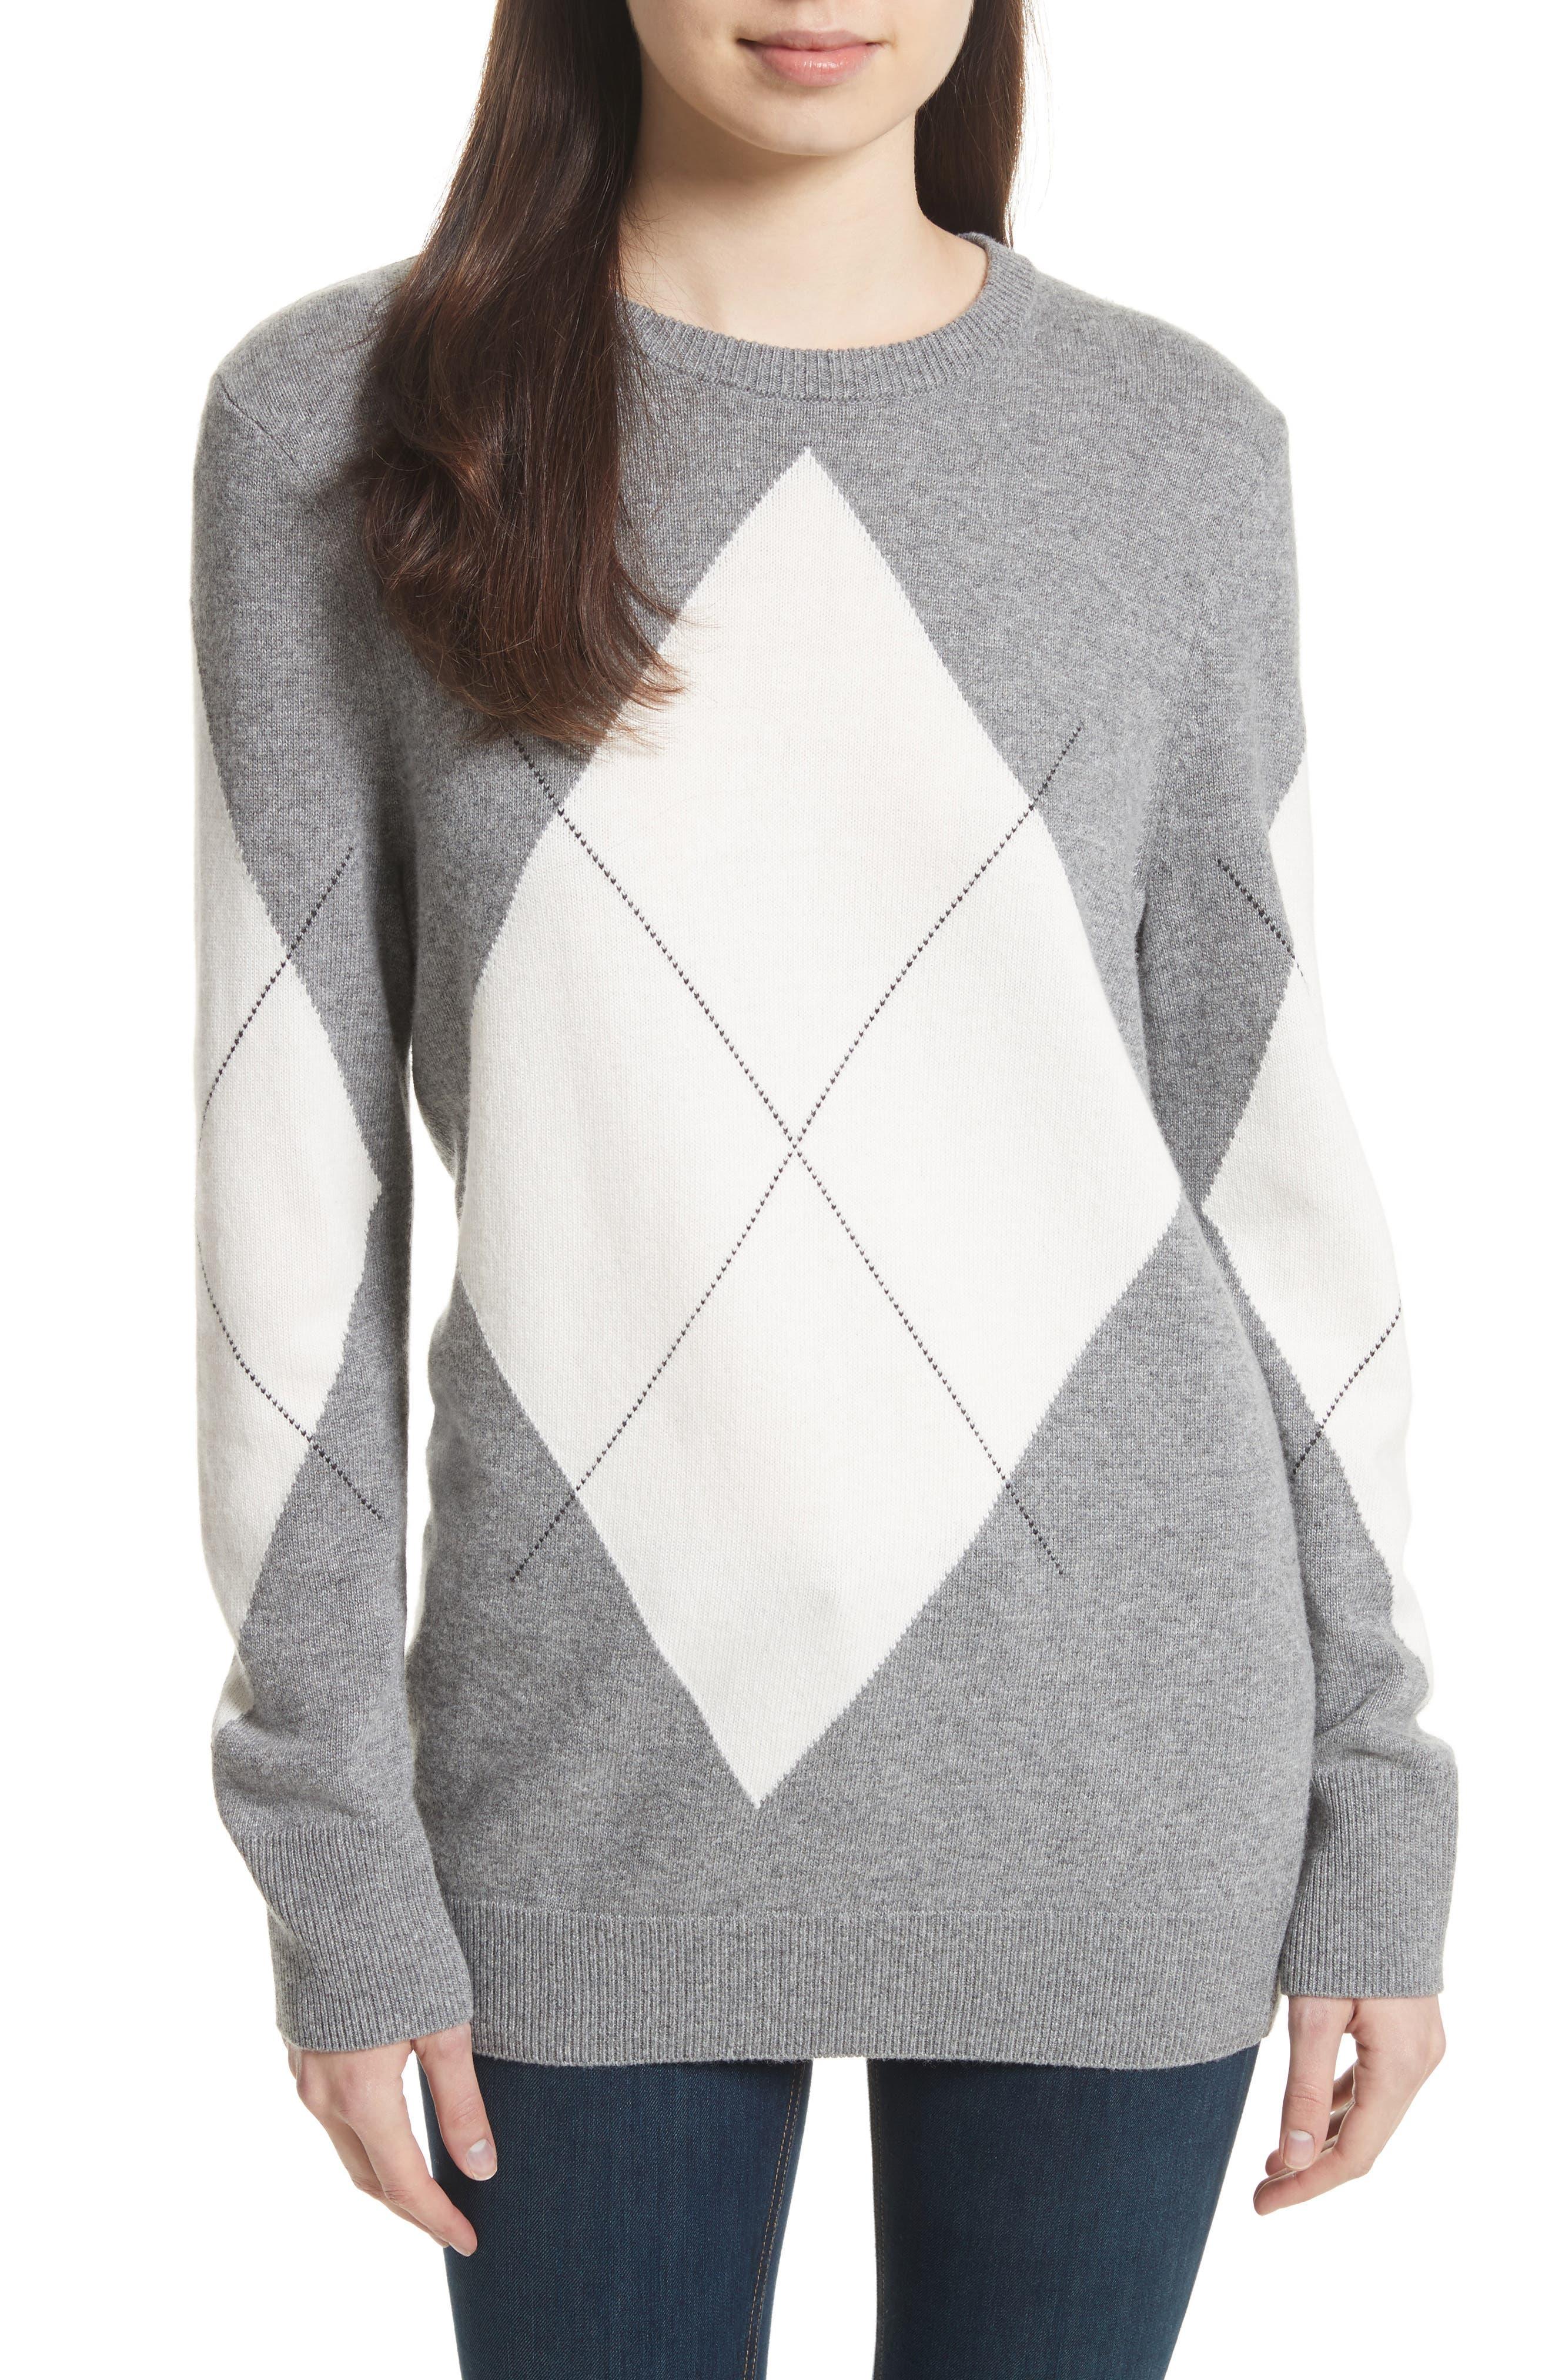 Main Image - Equipment Rei Argyle Crewneck Sweater